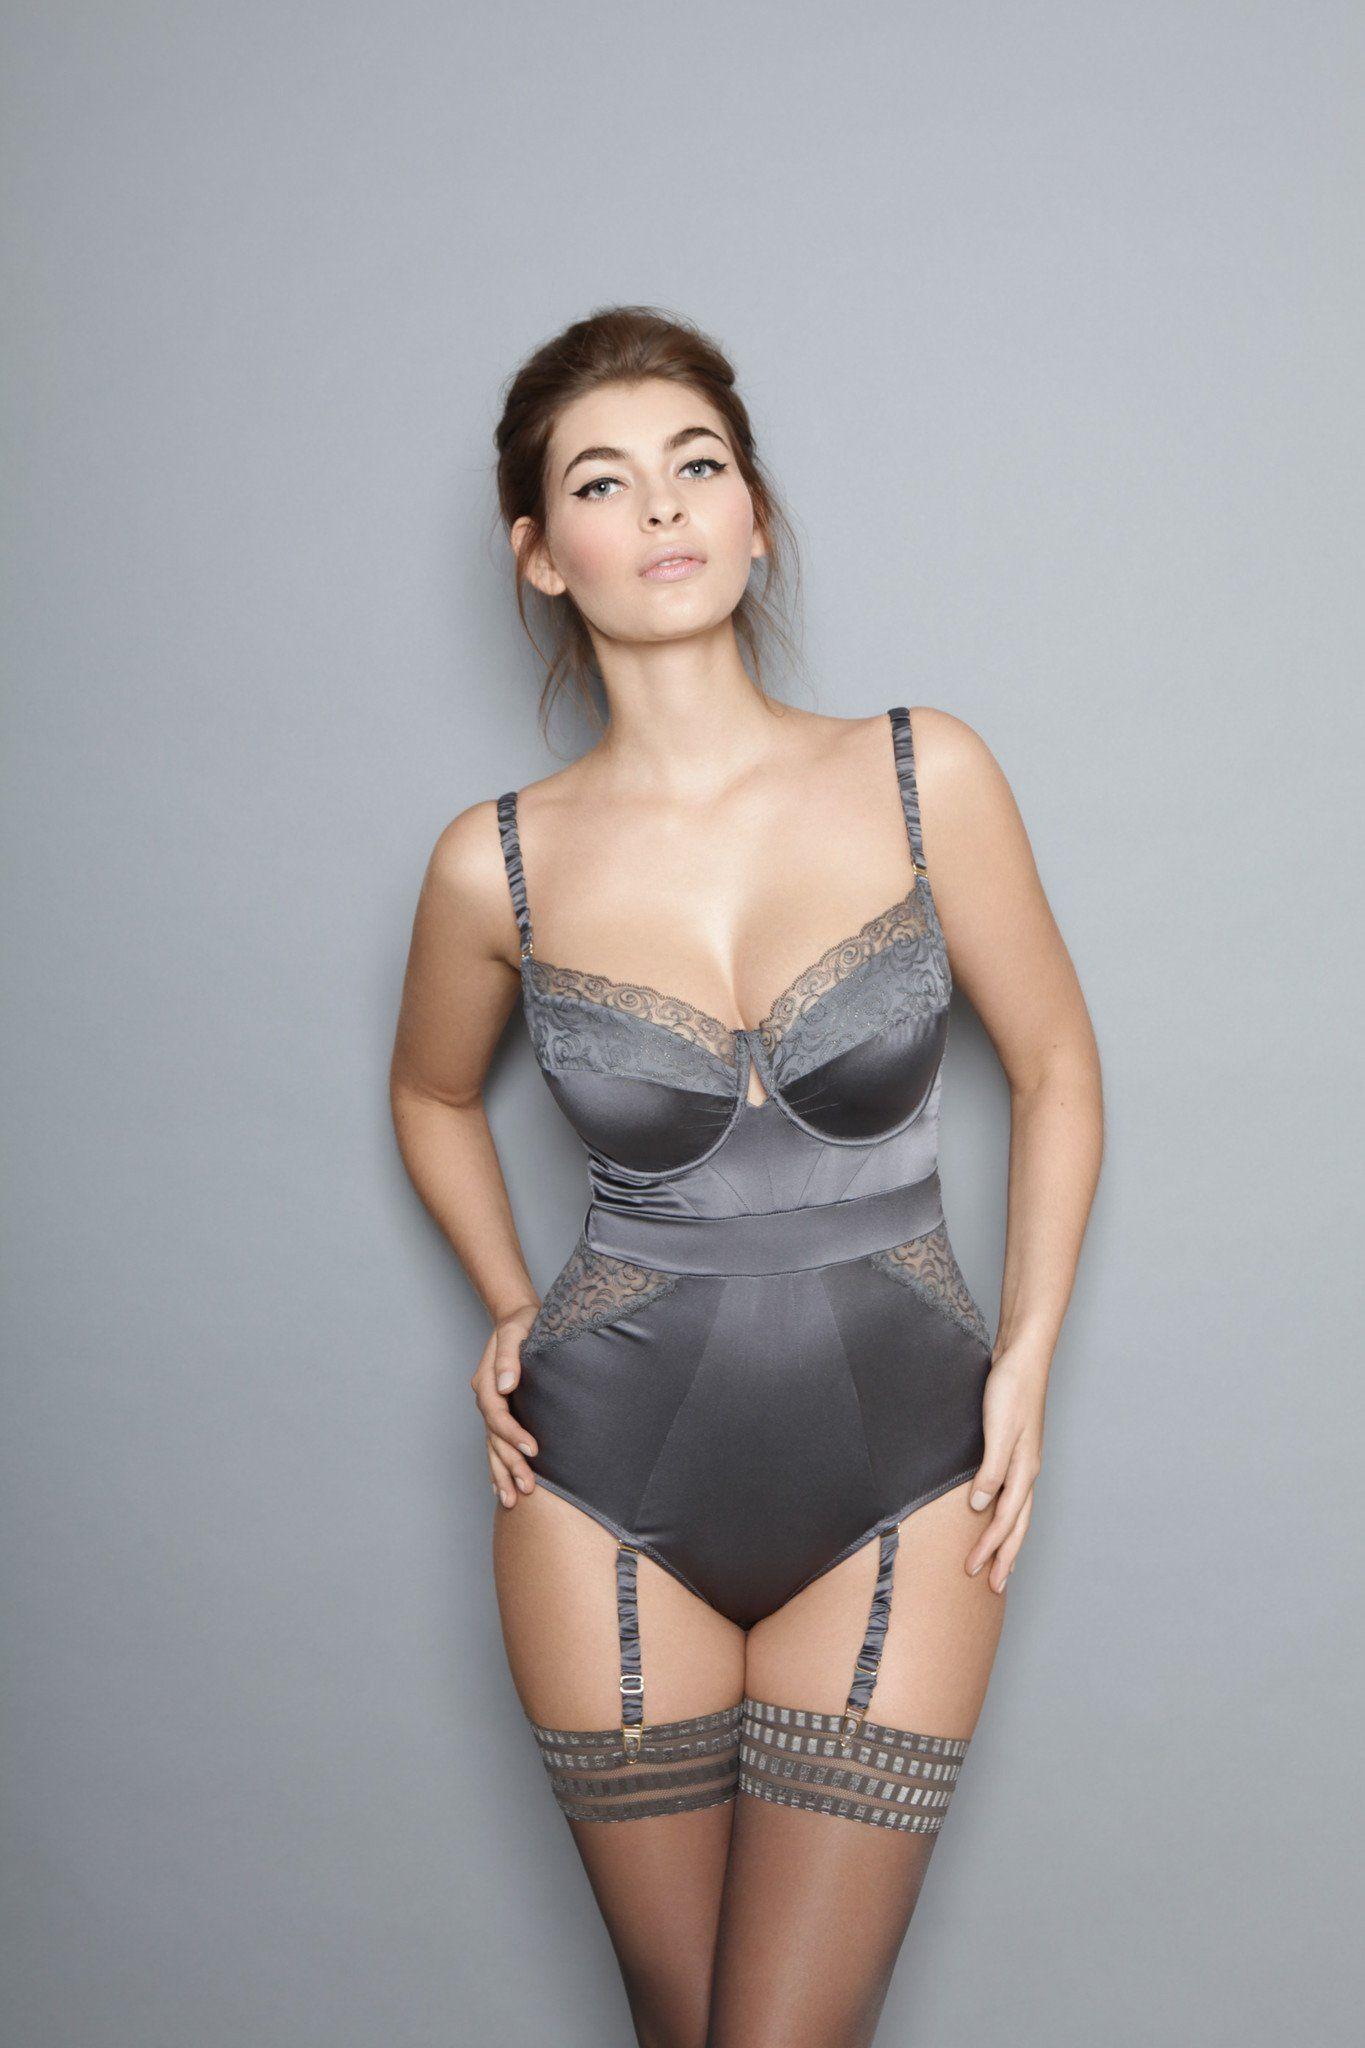 964fe3f092 Pin by Daydream Valley on Underwear